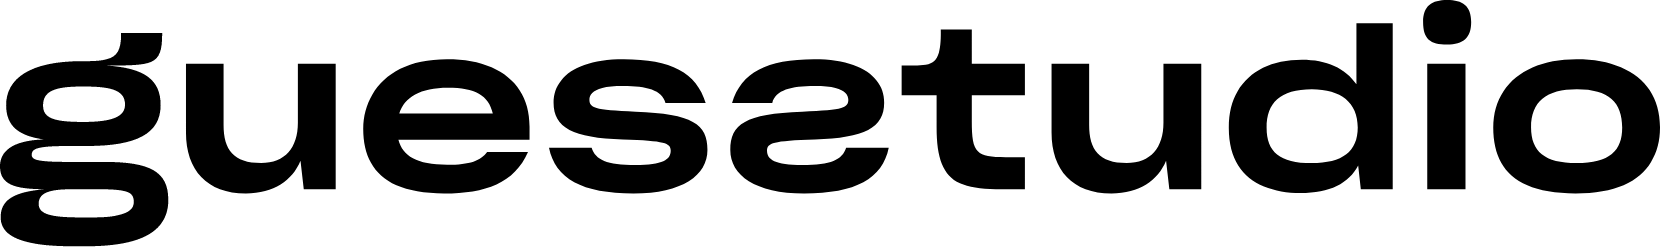 GUESSTUDIO